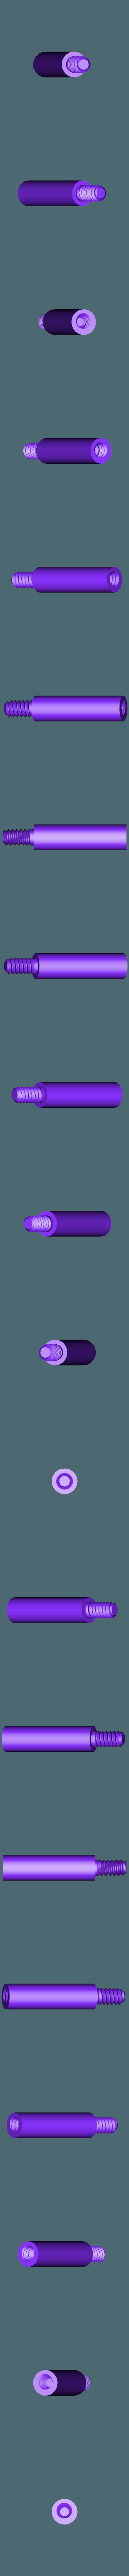 Barrel_-_Part_4.stl Download free STL file 9 gague plasma pistol with barrel tip cover (MPMS mini) • 3D print template, PM_ME_YOUR_VALUE